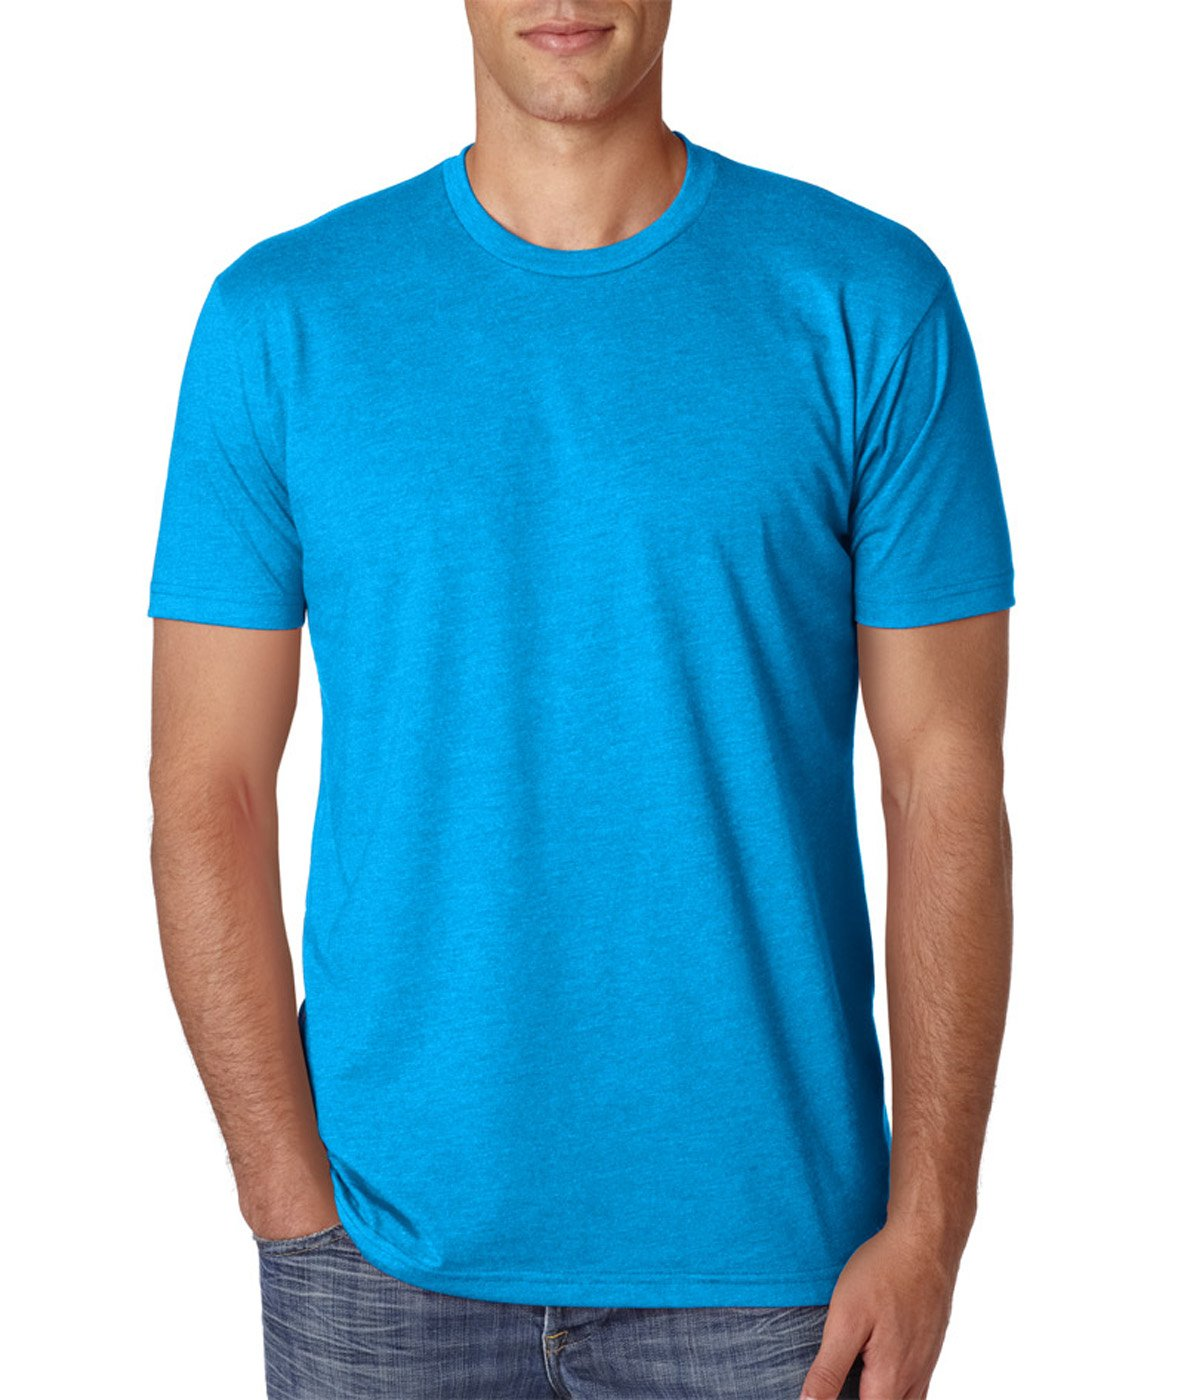 Next Level Apparel メンズ CVC クルーネック ジャージ Tシャツ B07D1C917P X-Large|Black + Turquoise (2 Pack) Black + Turquoise (2 Pack) X-Large